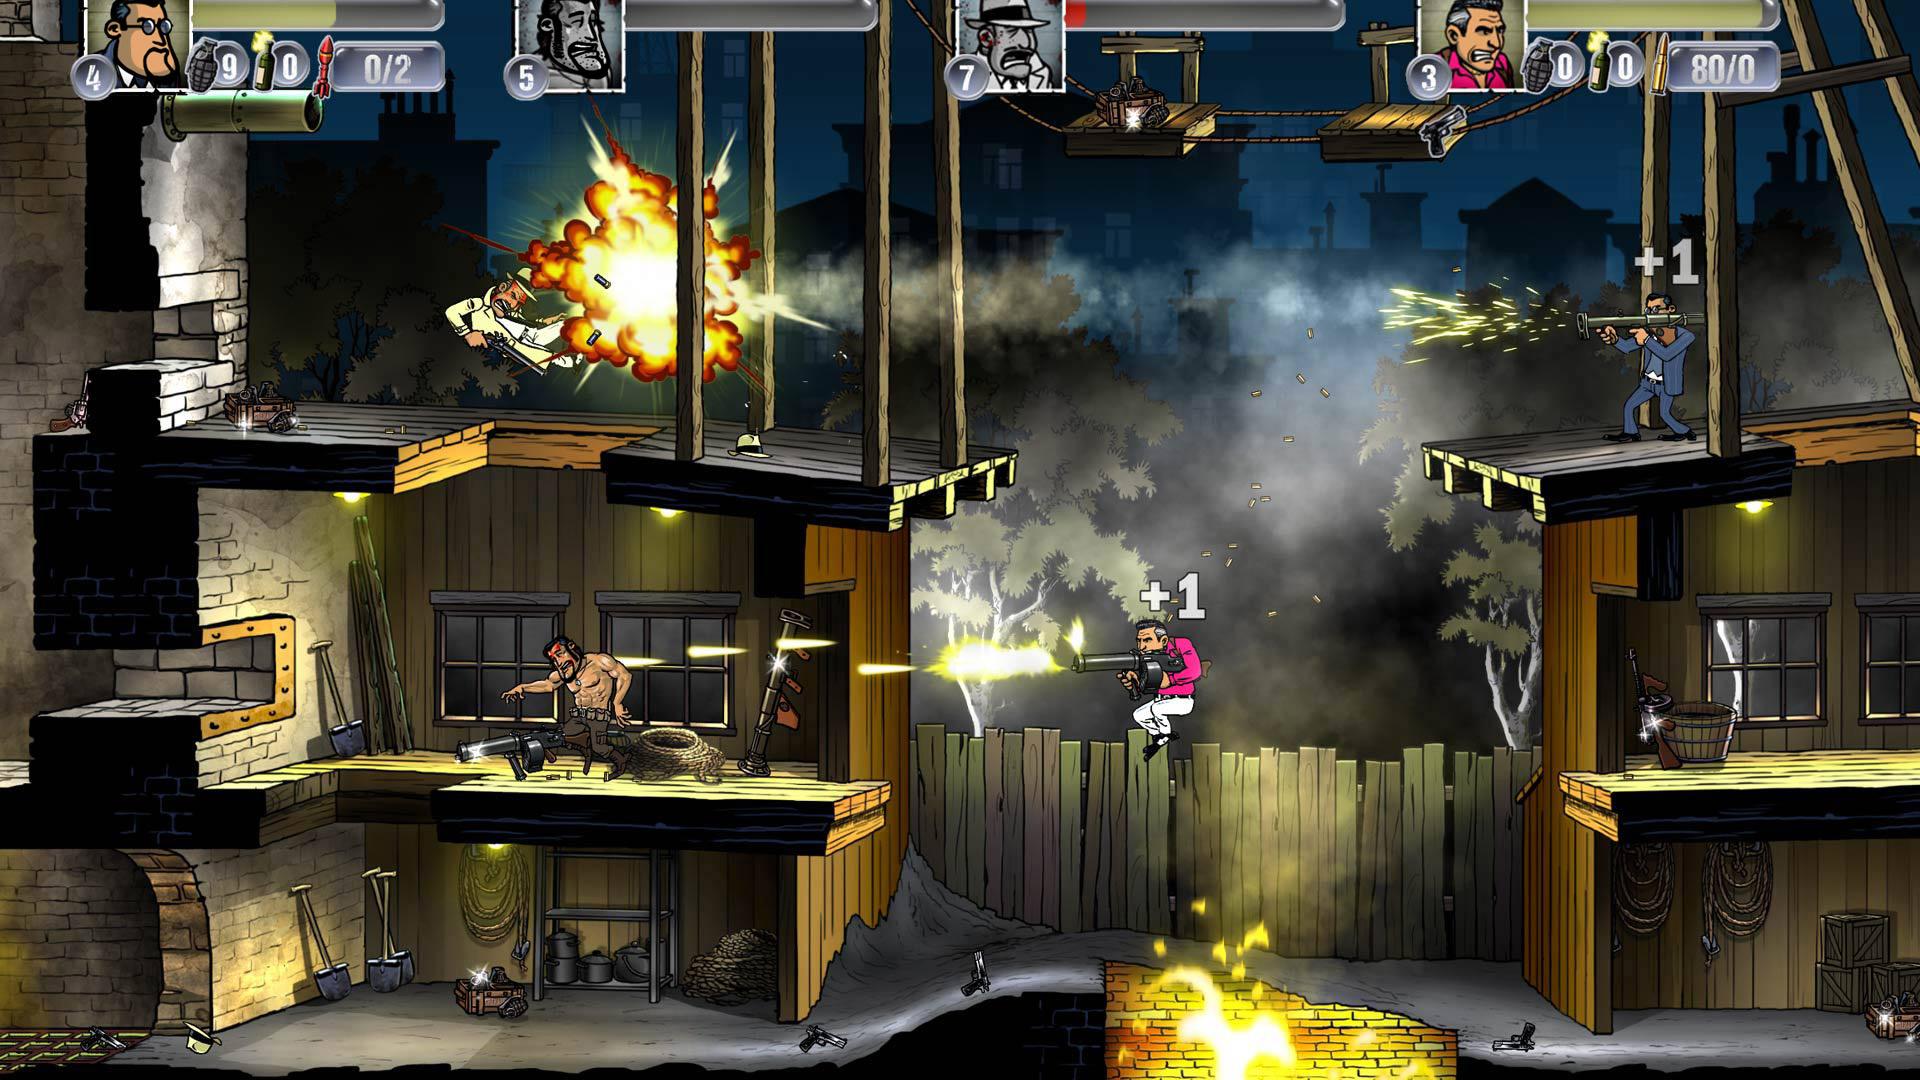 Guns Gore and Cannoli 2 for Mac 1.0.1 破解版 - 枪,血,意大利黑手党2